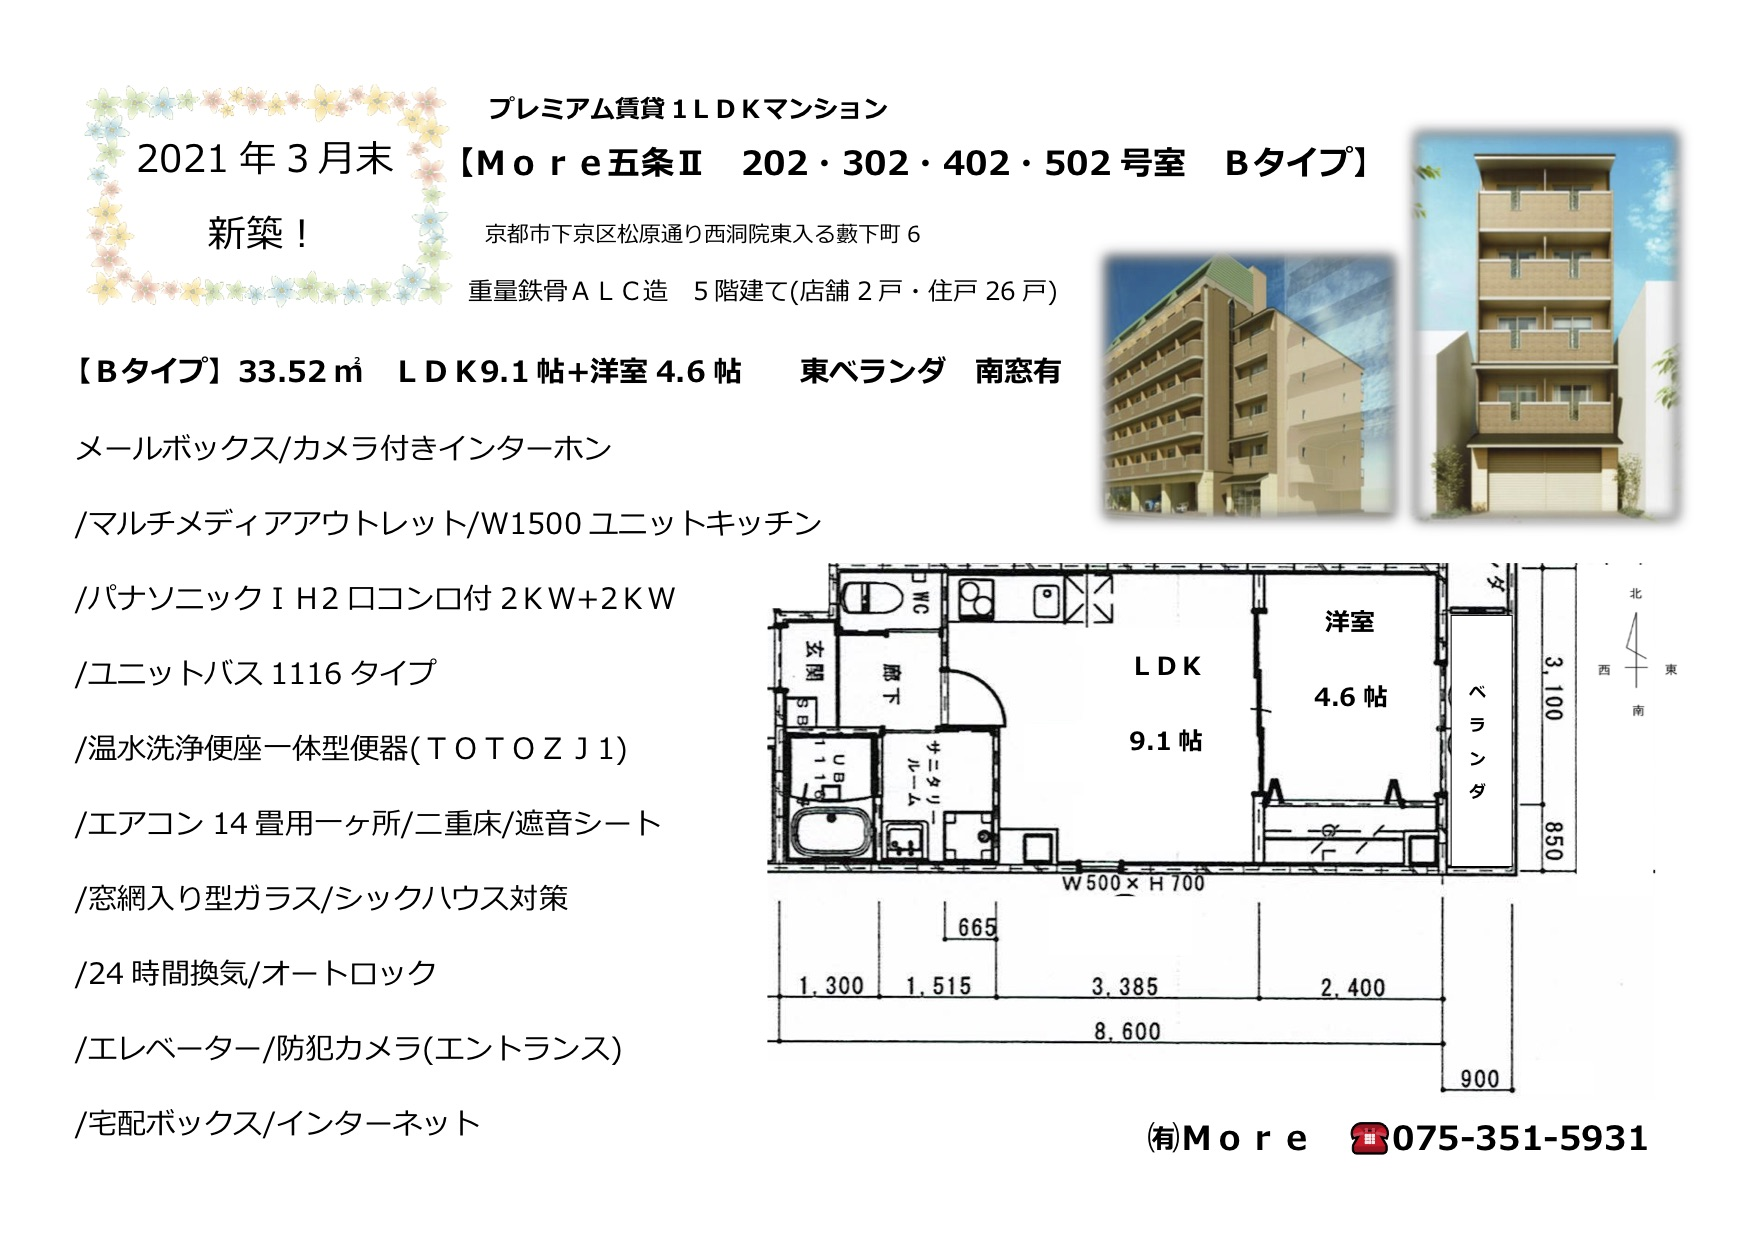 More五条Ⅱ 202・302・402・502号室